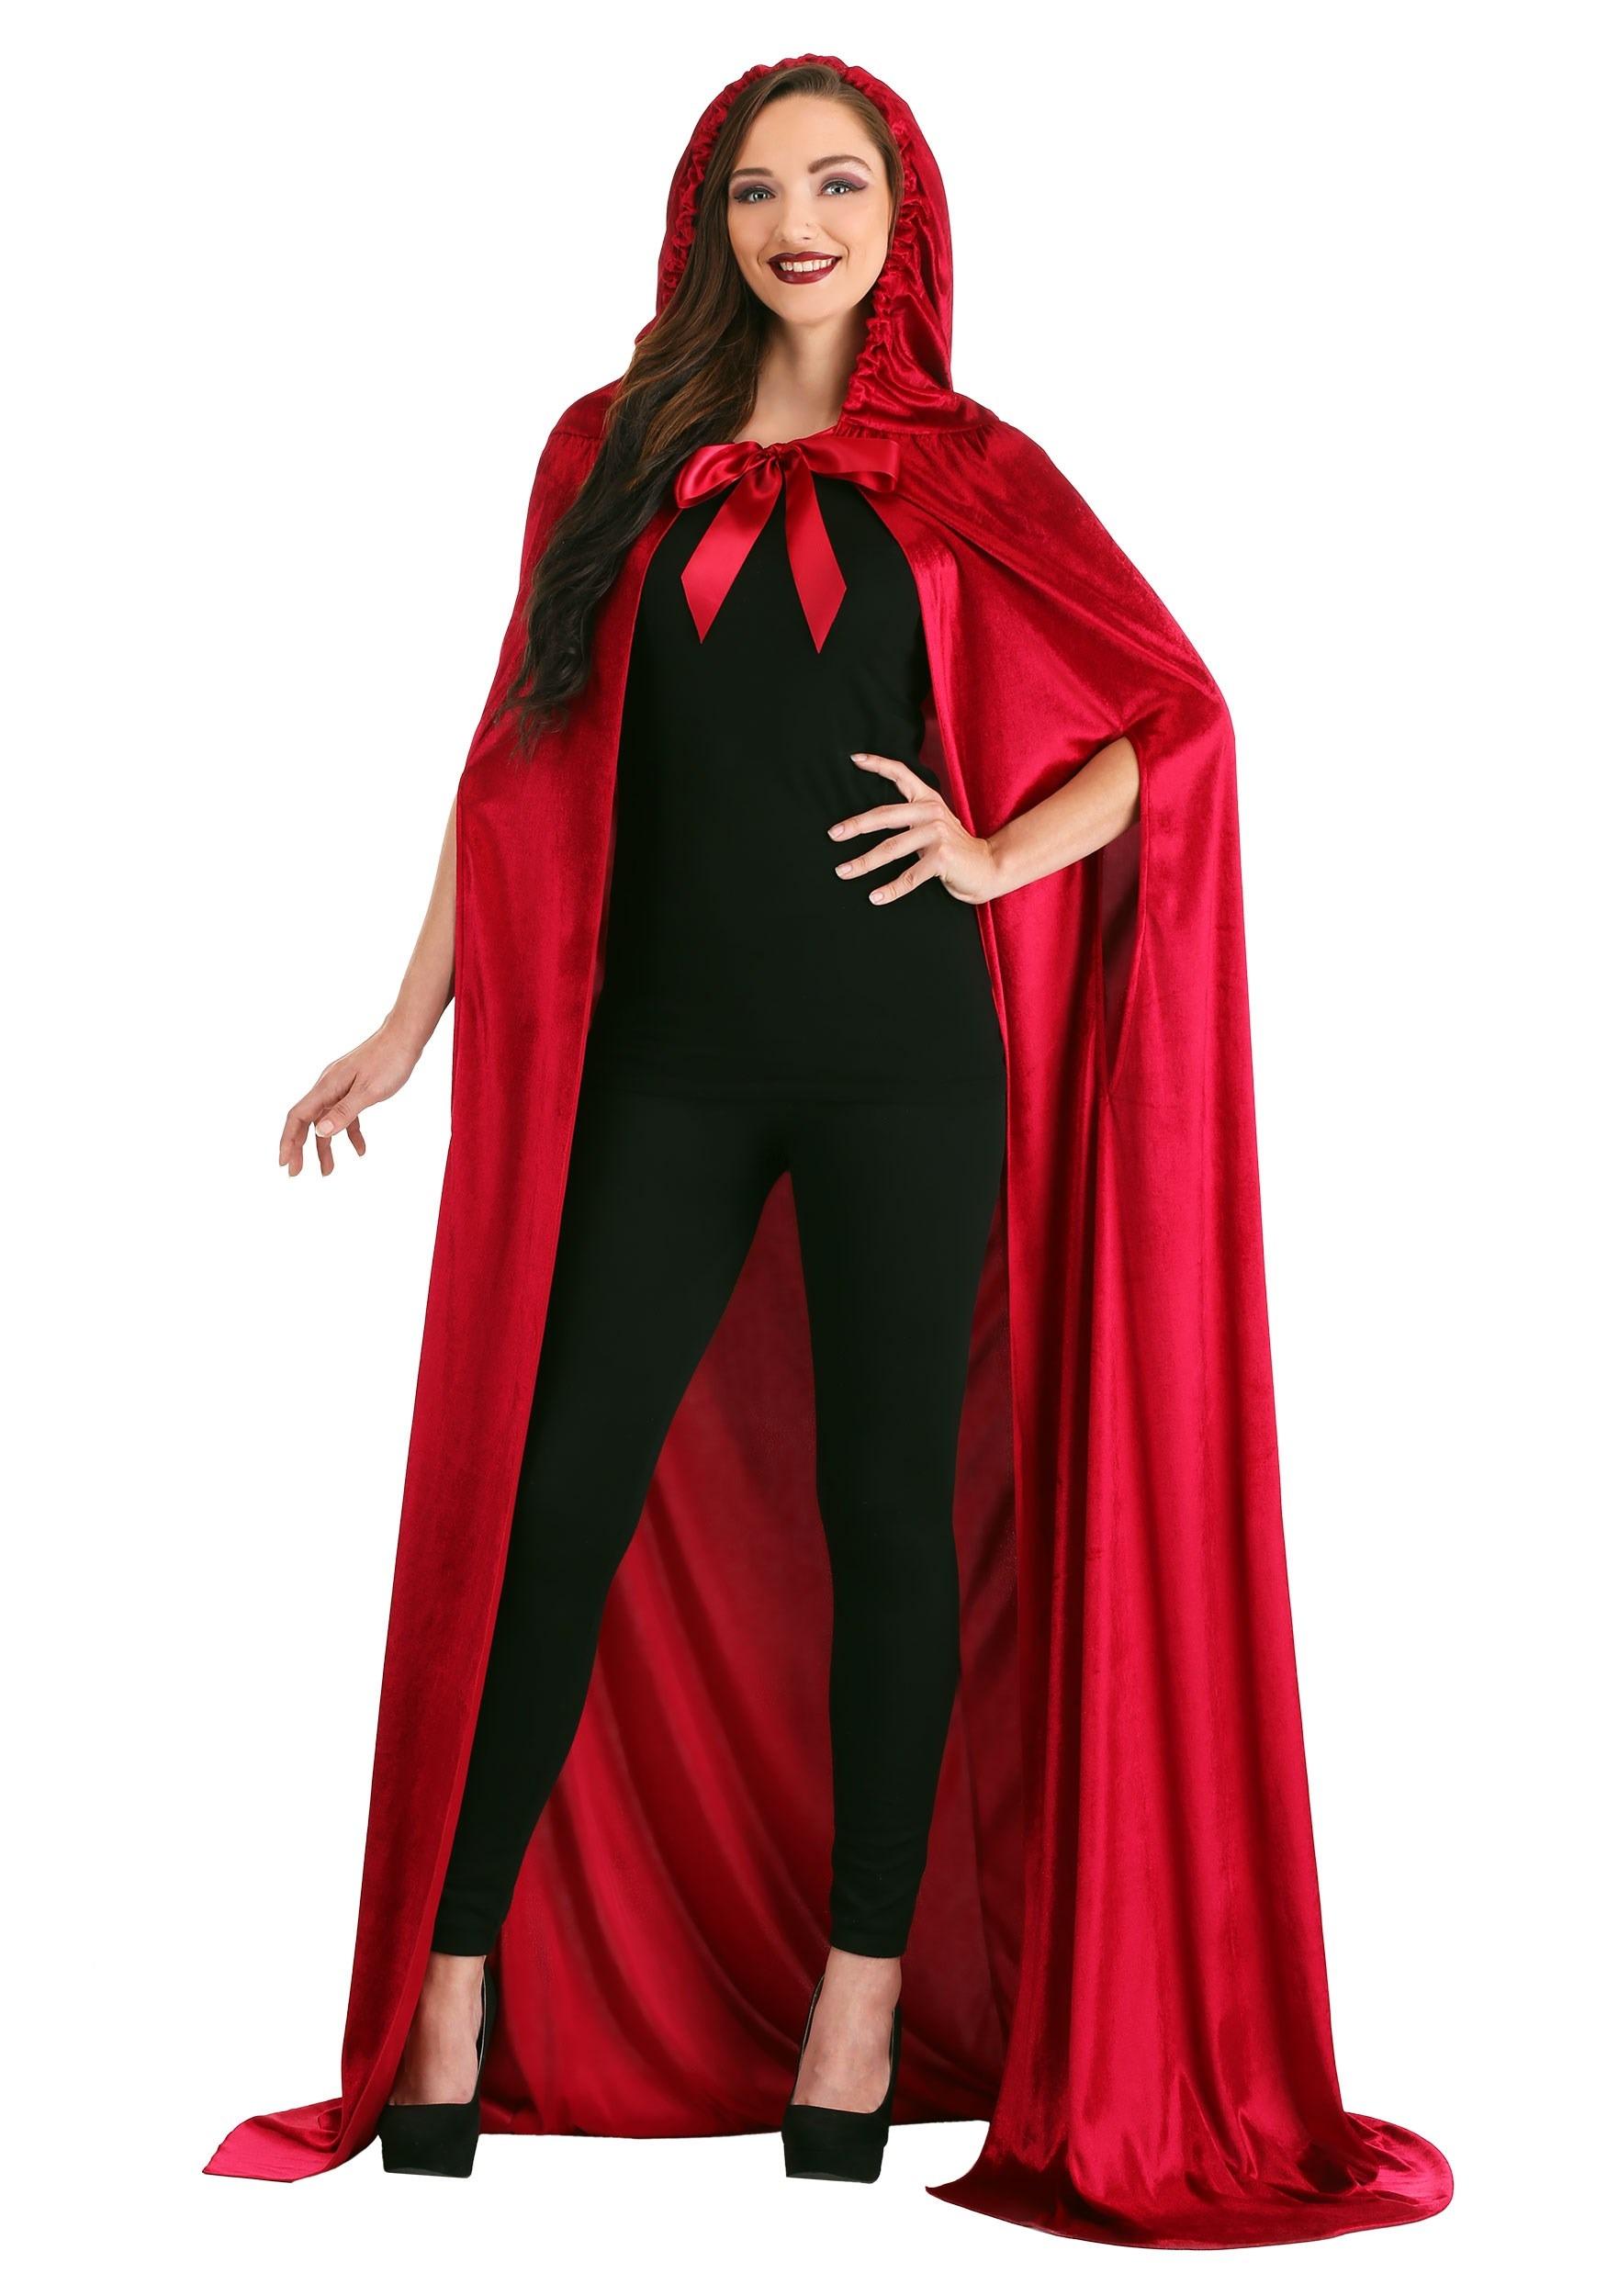 Crimson Riding Cloak for Adults